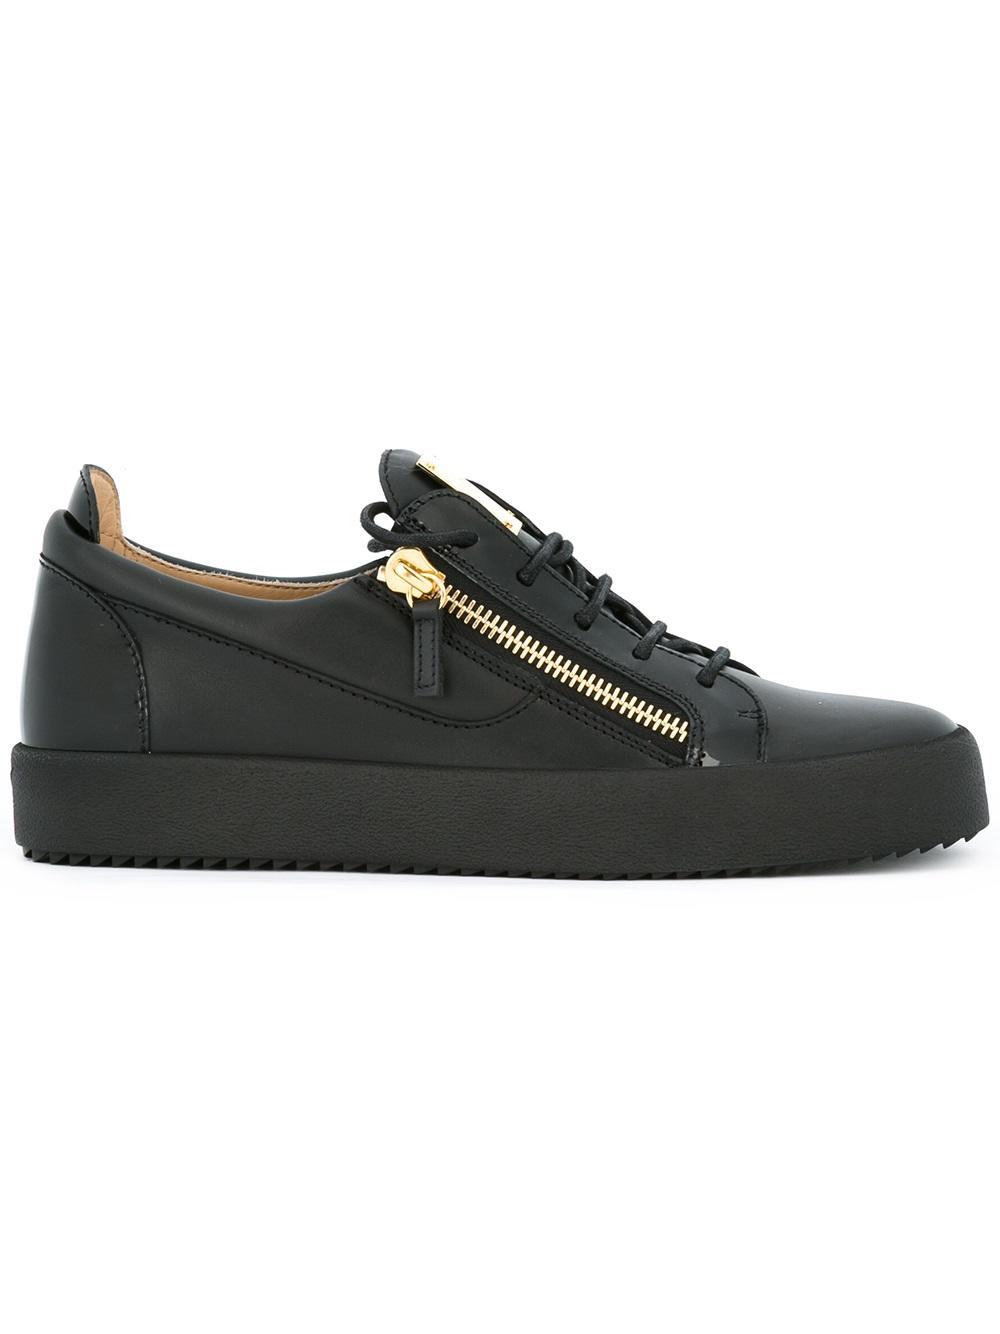 Giuseppe Zanotti Giuseppe Zanotti Frankie Low-Top Sneakers